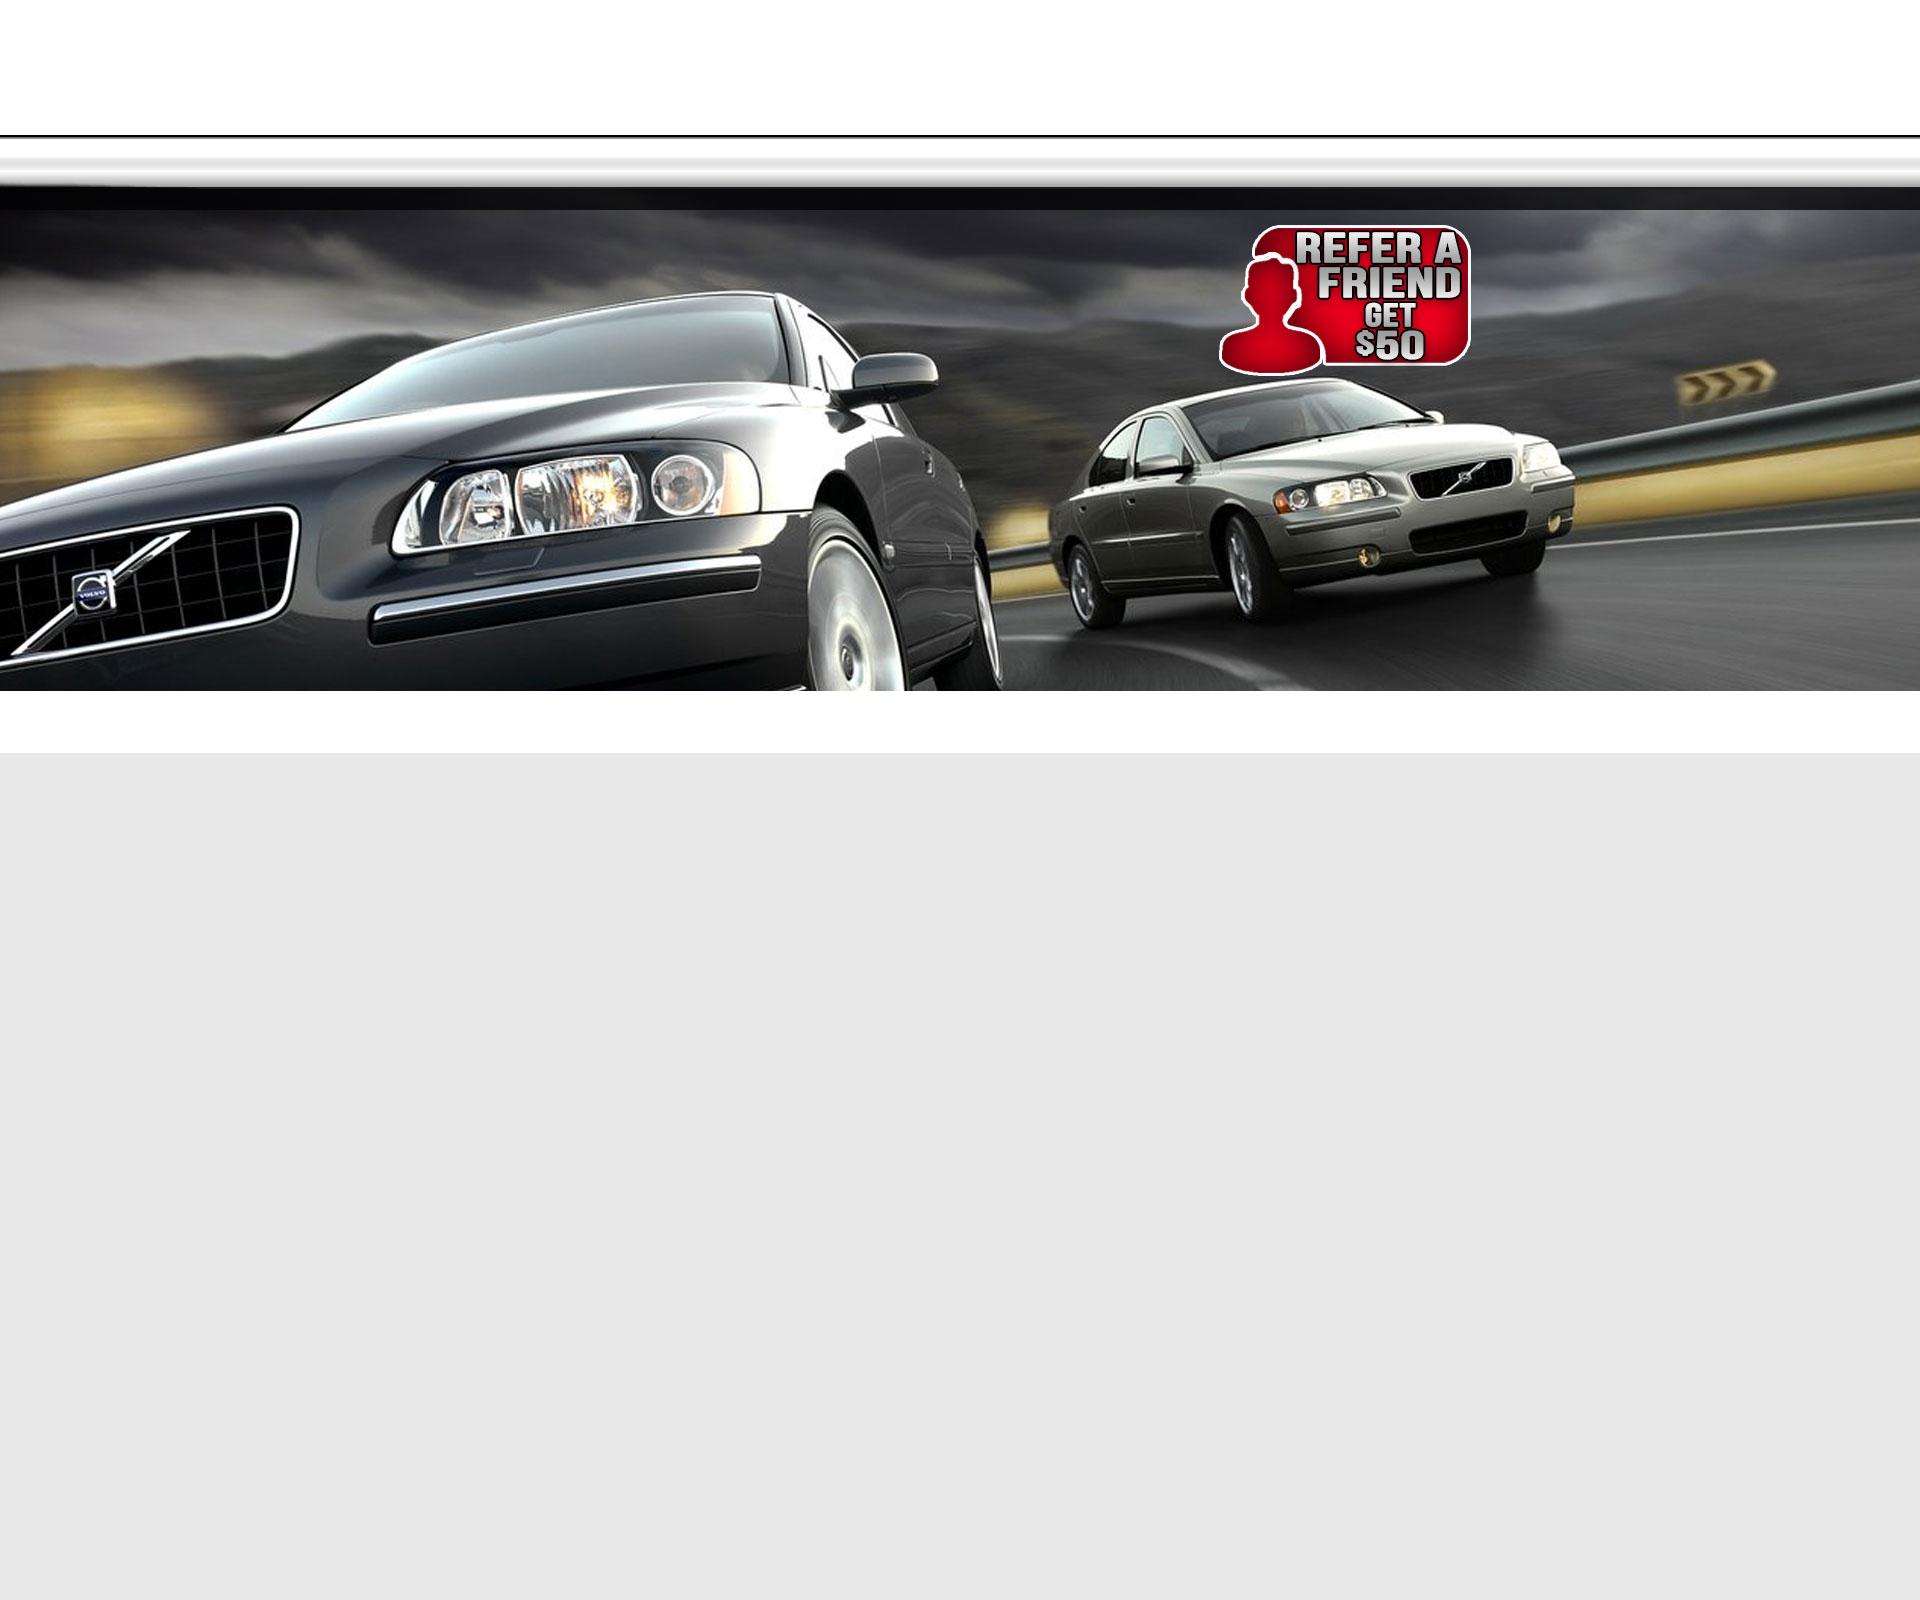 Marvelous Motors Used Cars Garden City ID Dealer